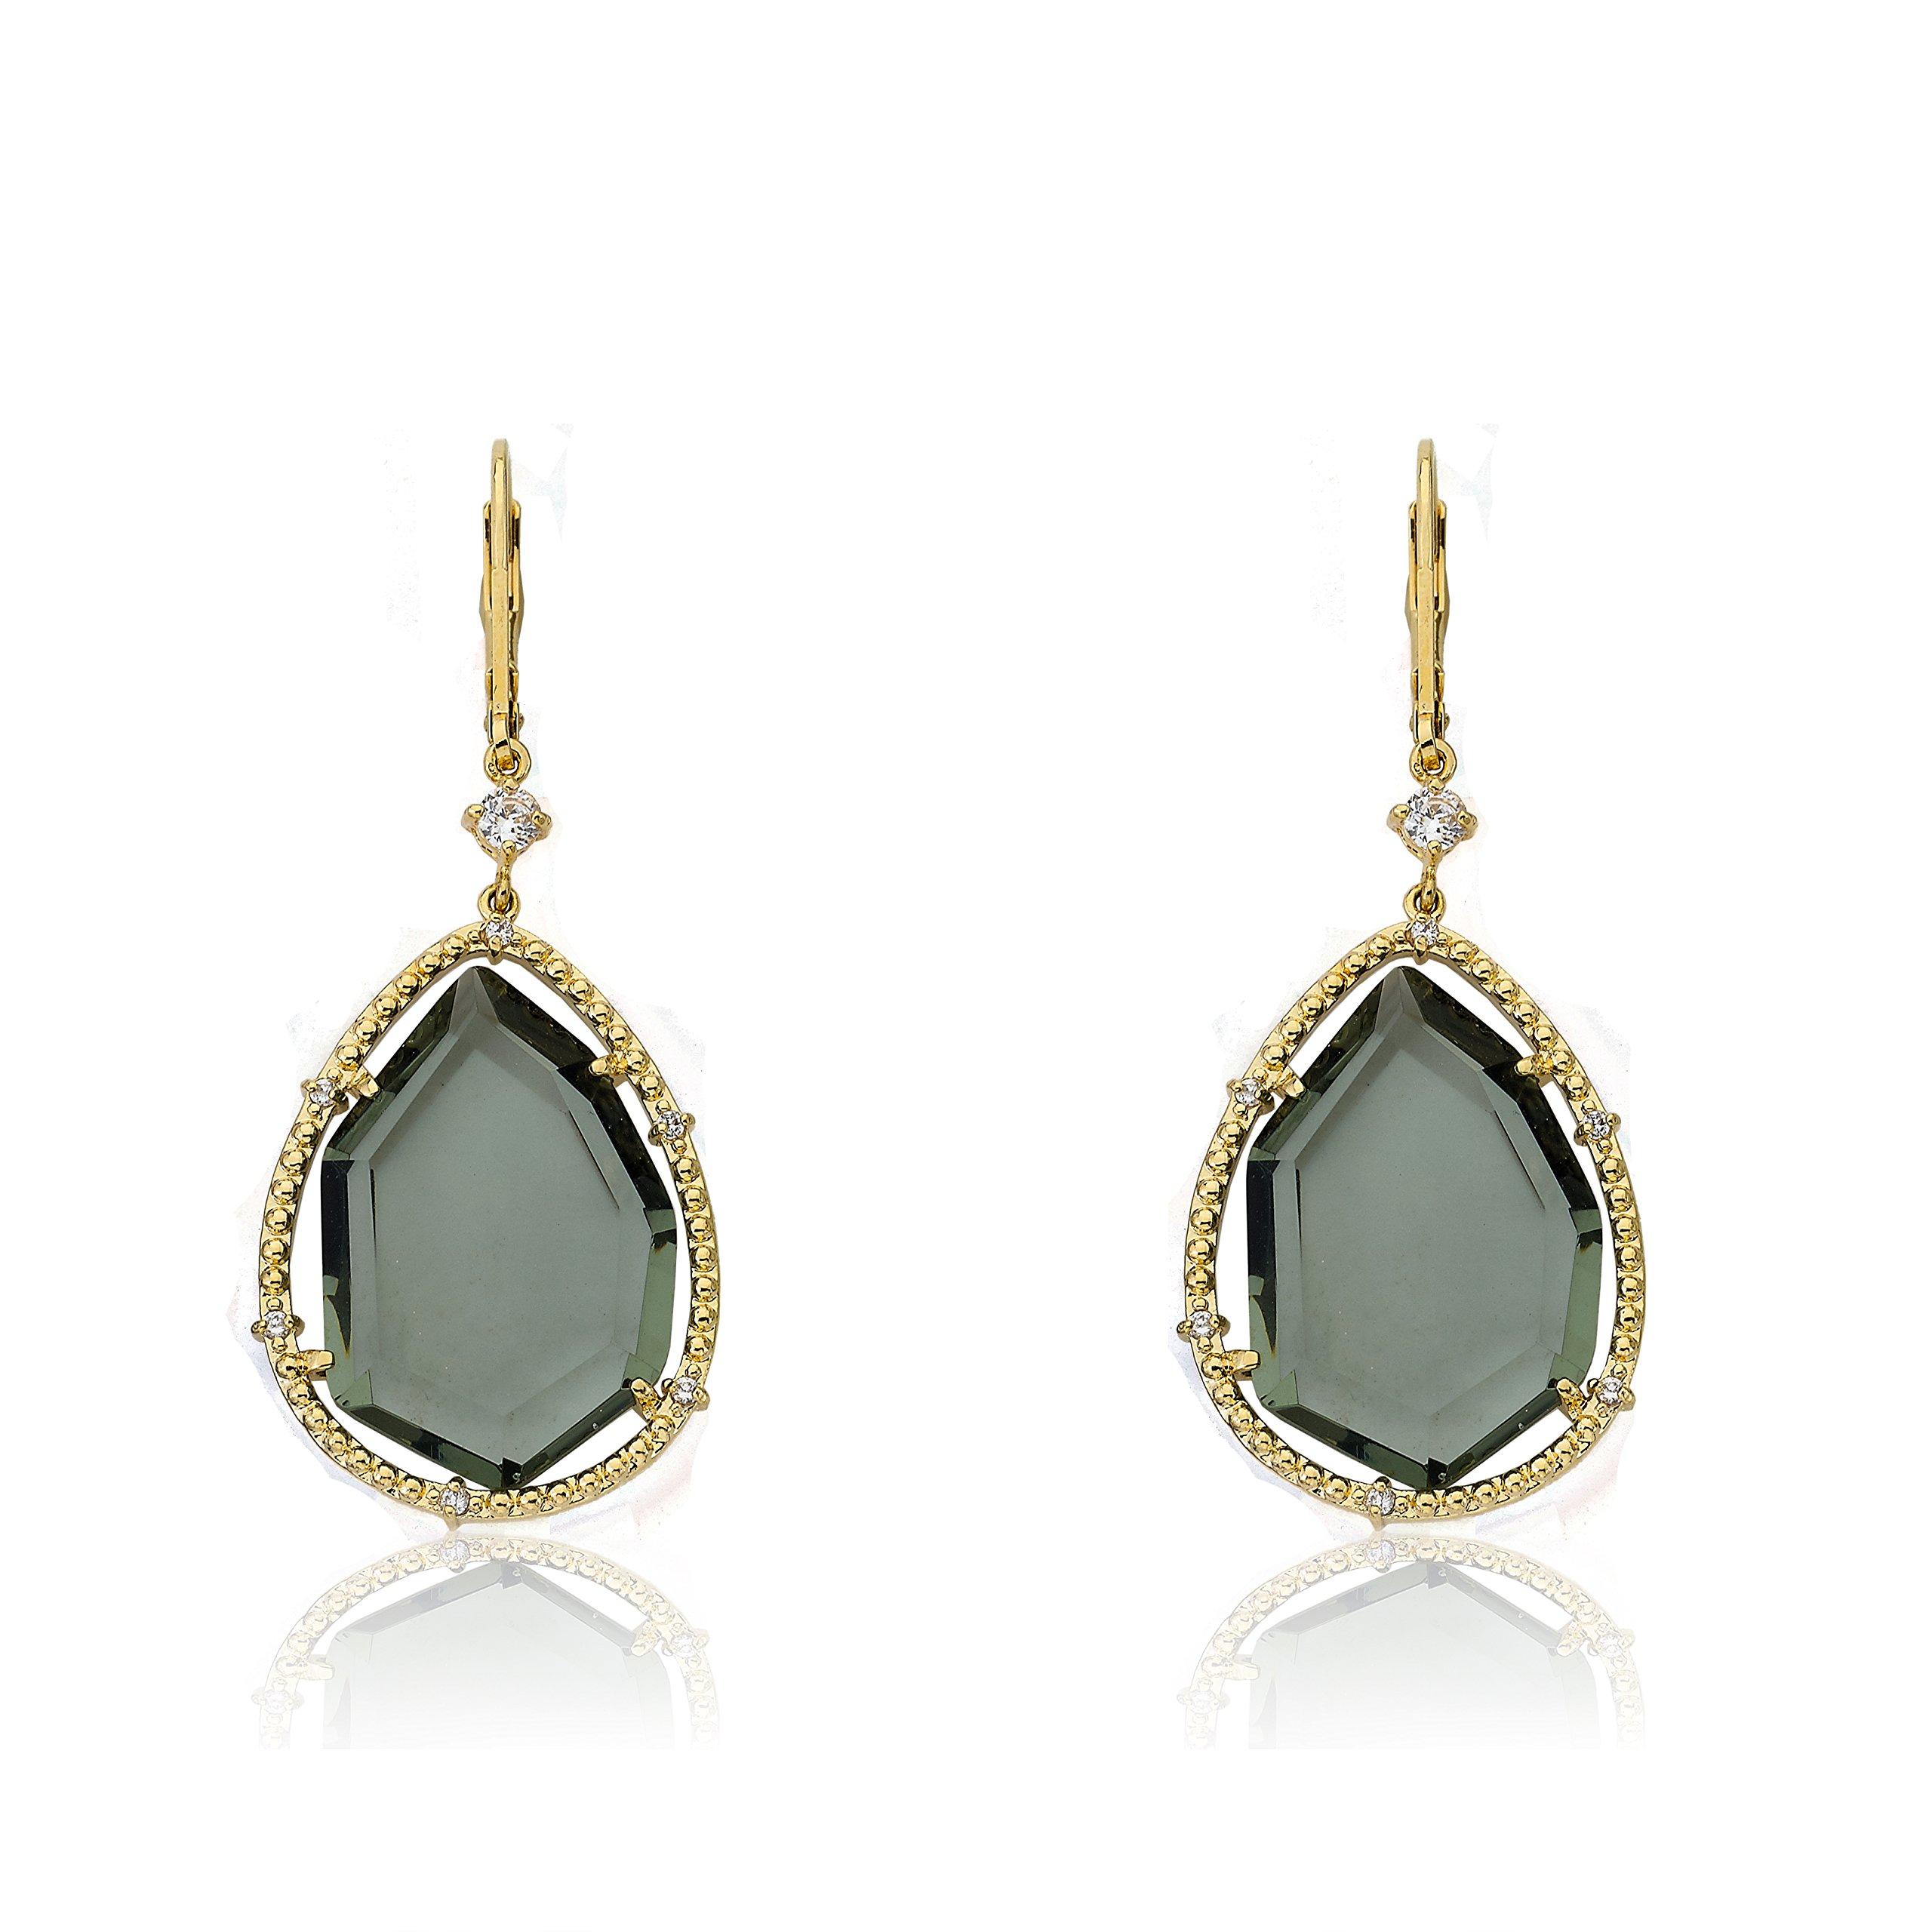 Riccova Sliced Glass 14k Gold-Plated CZ Trimmed Black Sliced Glass Teardrop Dangle Earring by Riccova